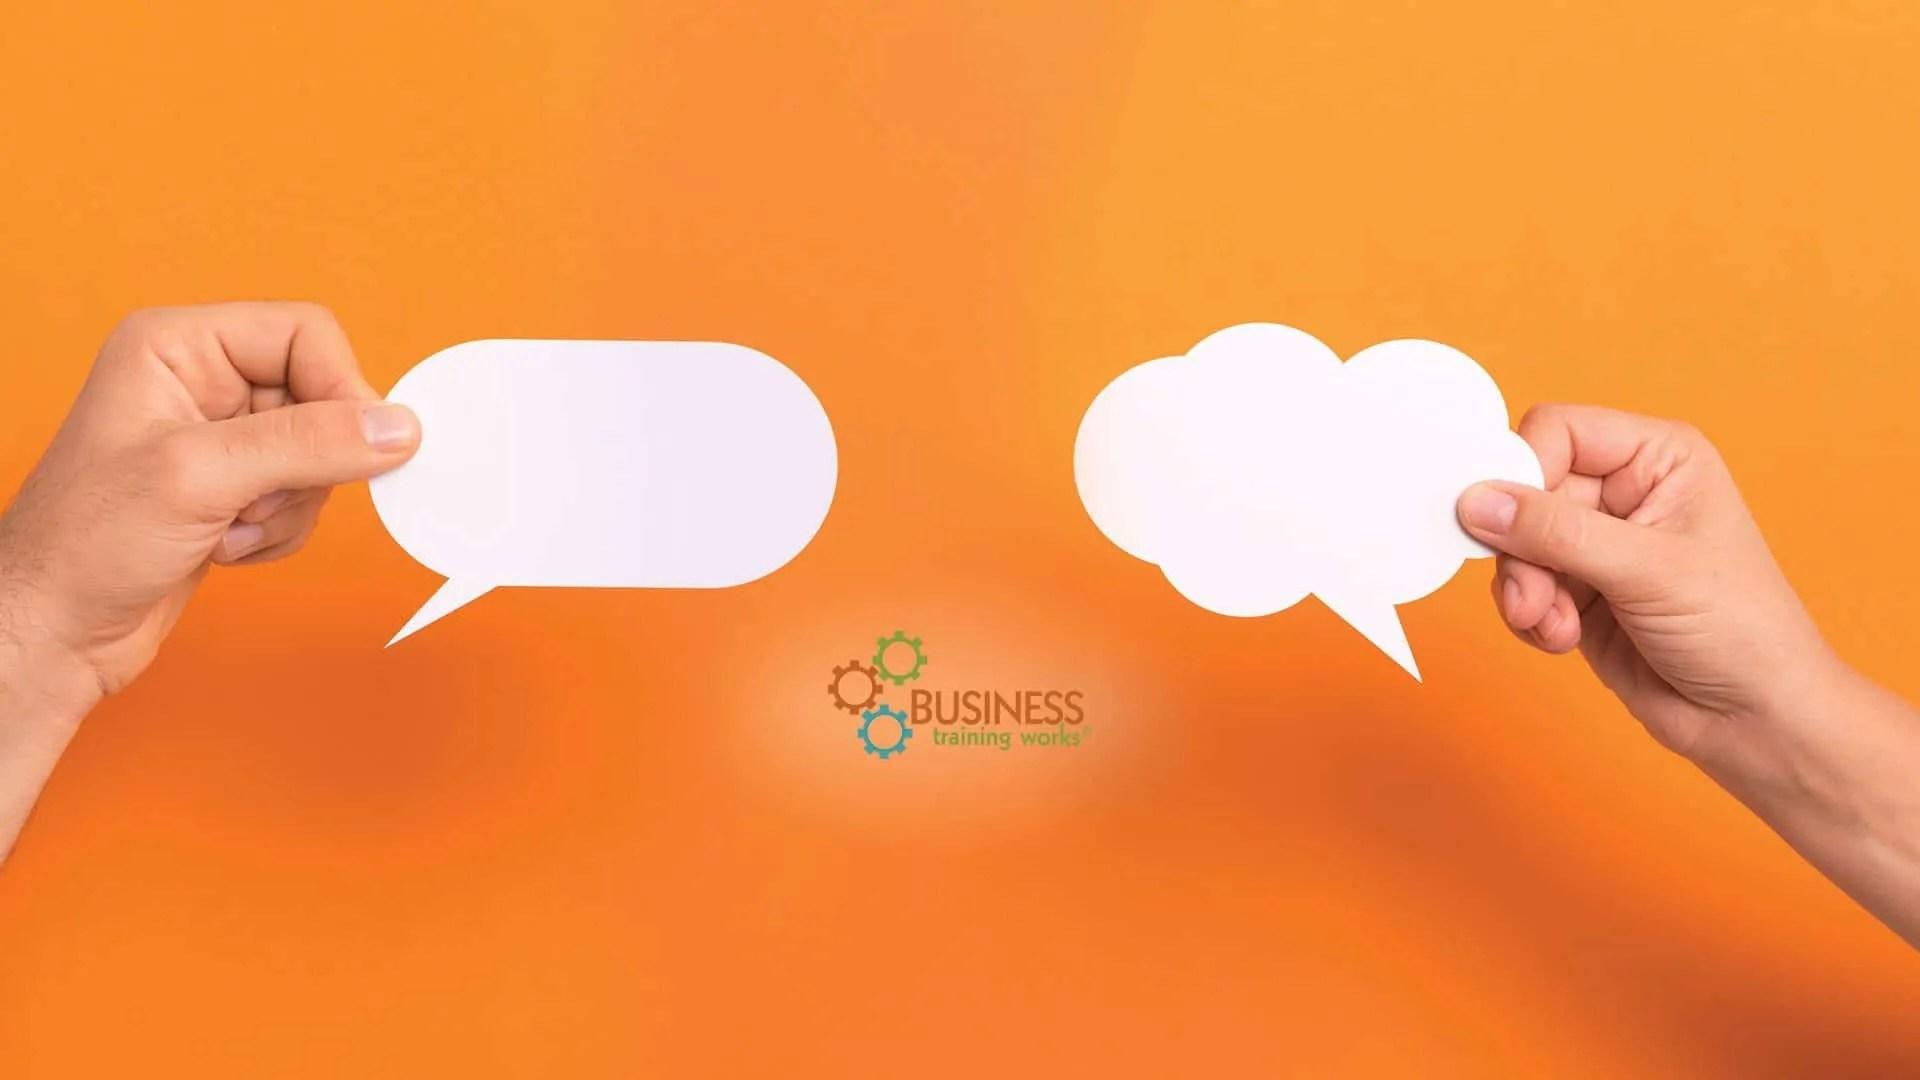 Workplace Communication Skills Training